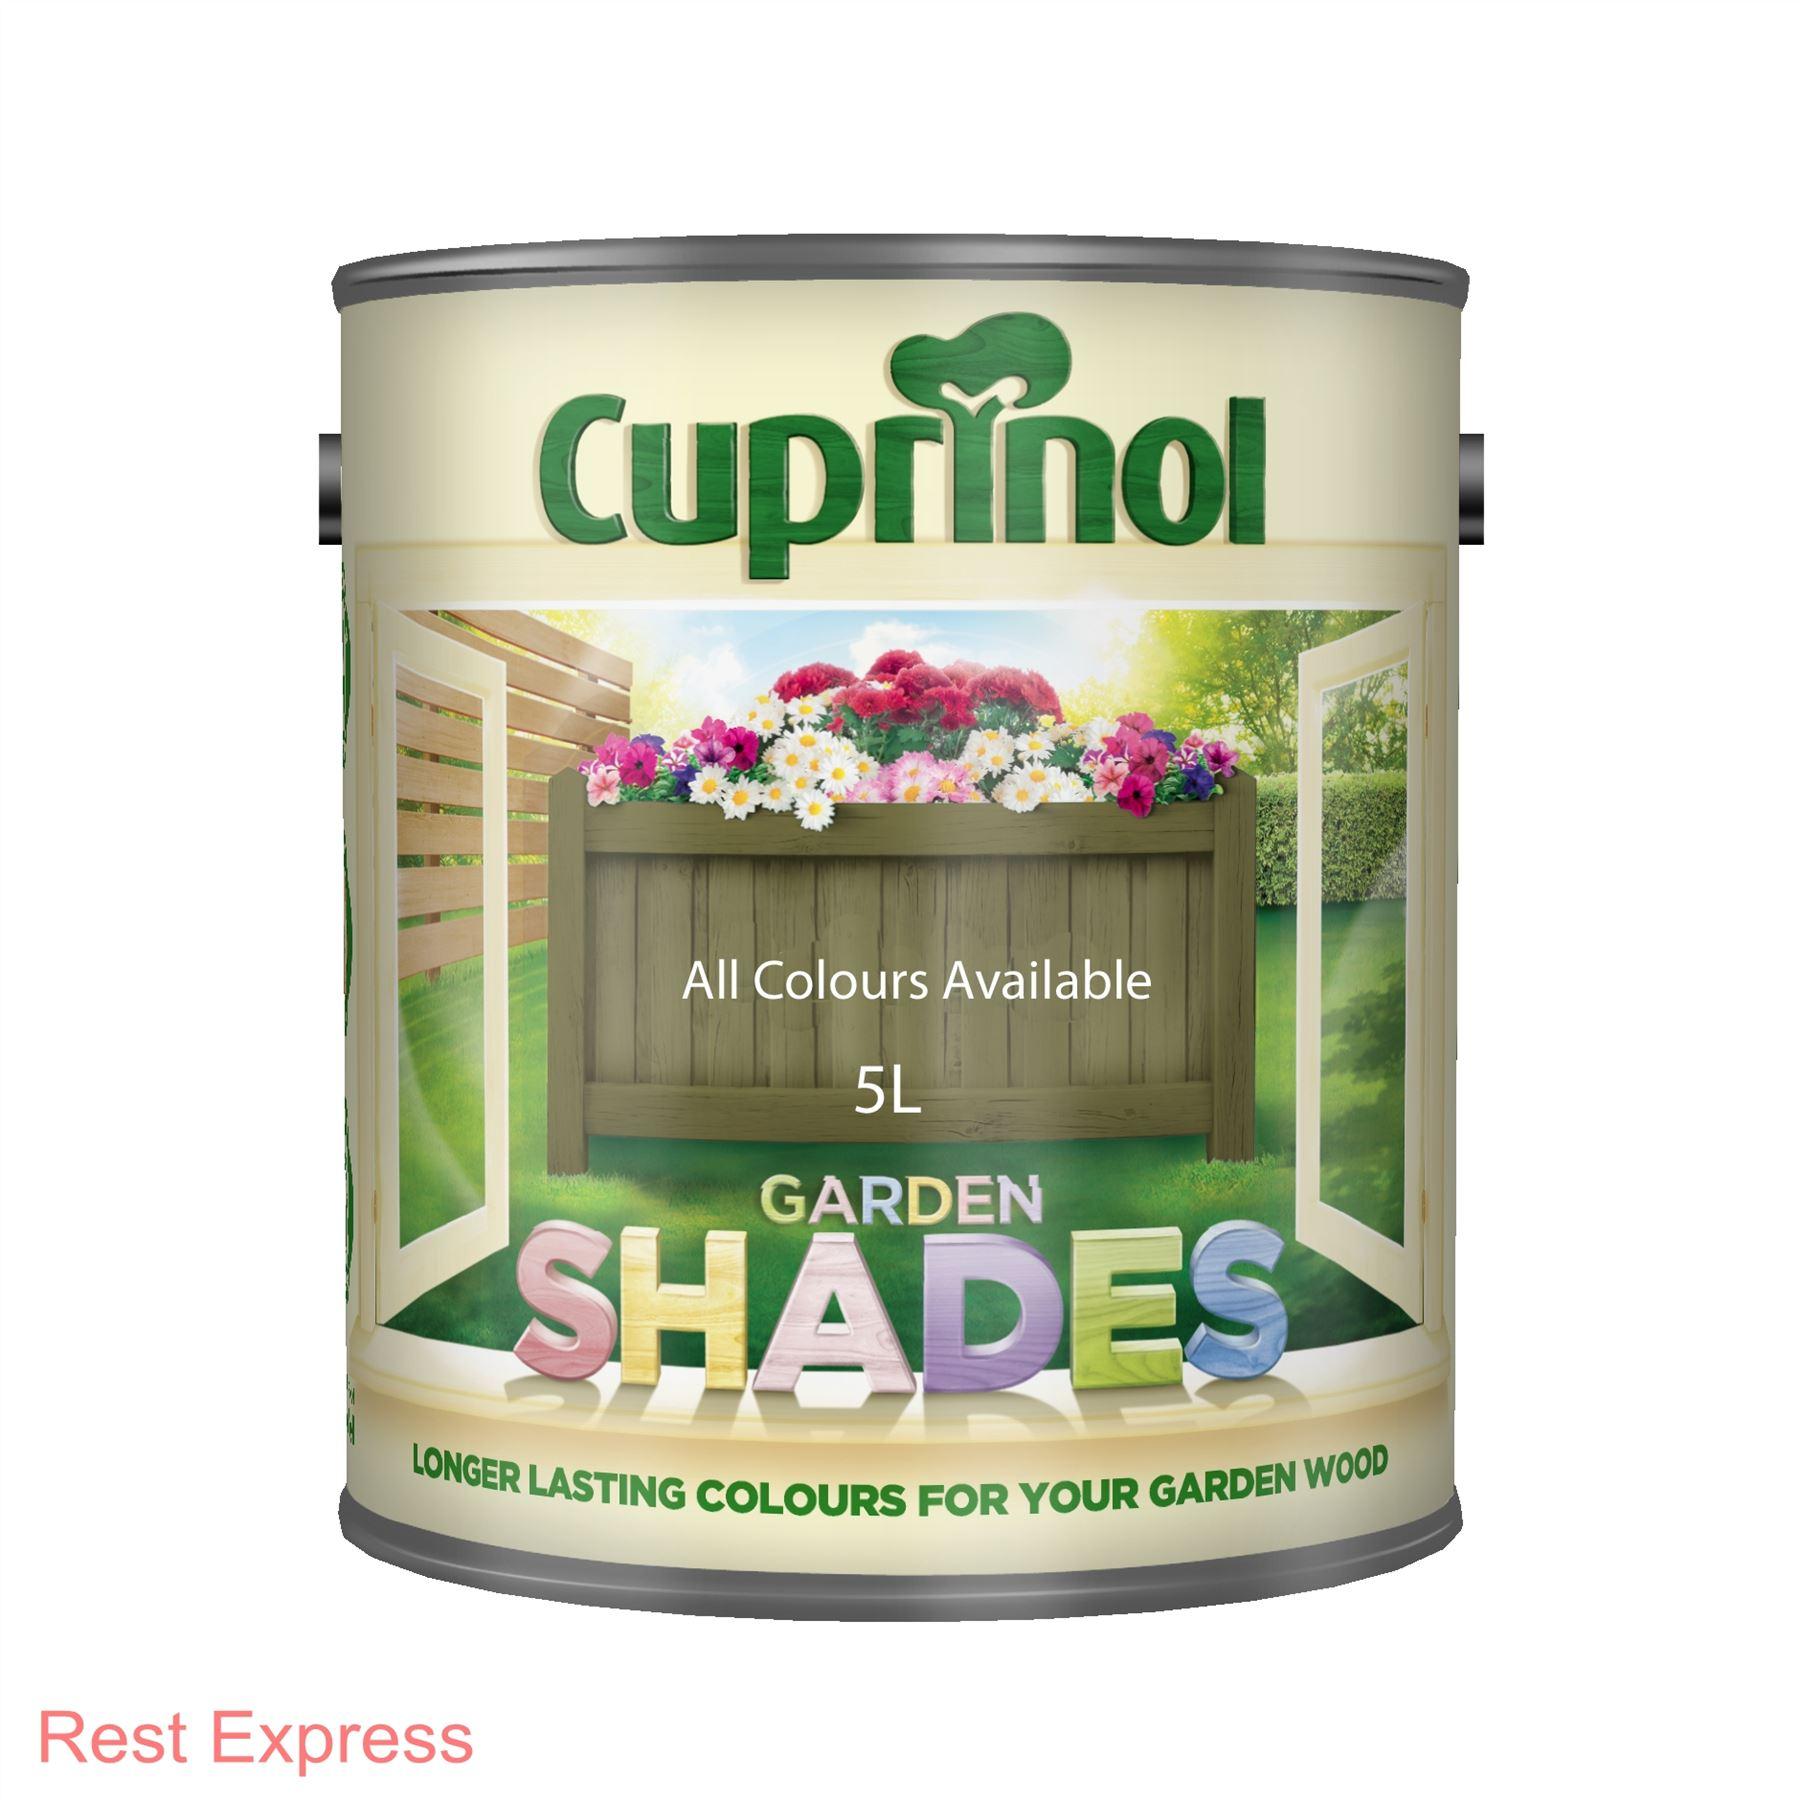 cuprinol garden shades wood shed fence paint stain 5. Black Bedroom Furniture Sets. Home Design Ideas